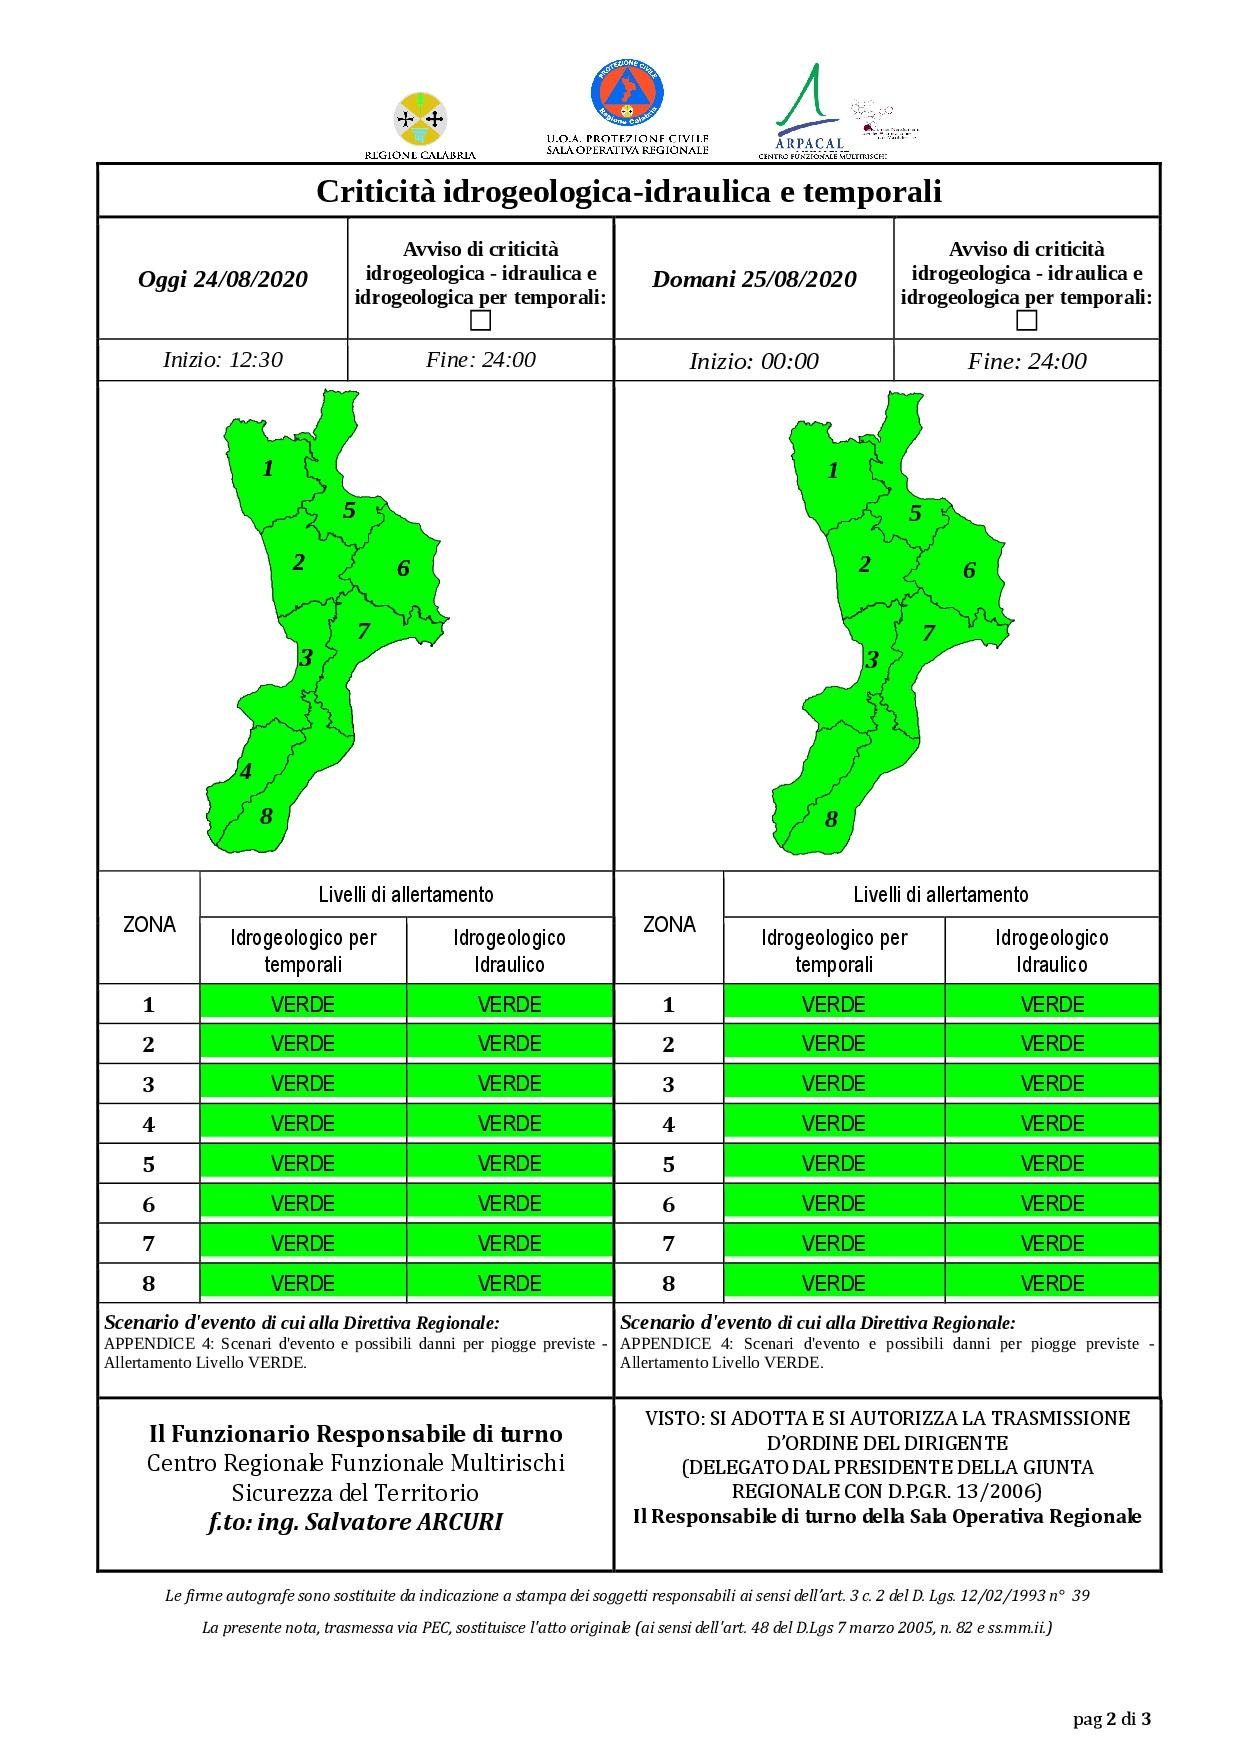 Criticità idrogeologica-idraulica e temporali in Calabria 24-08-2020